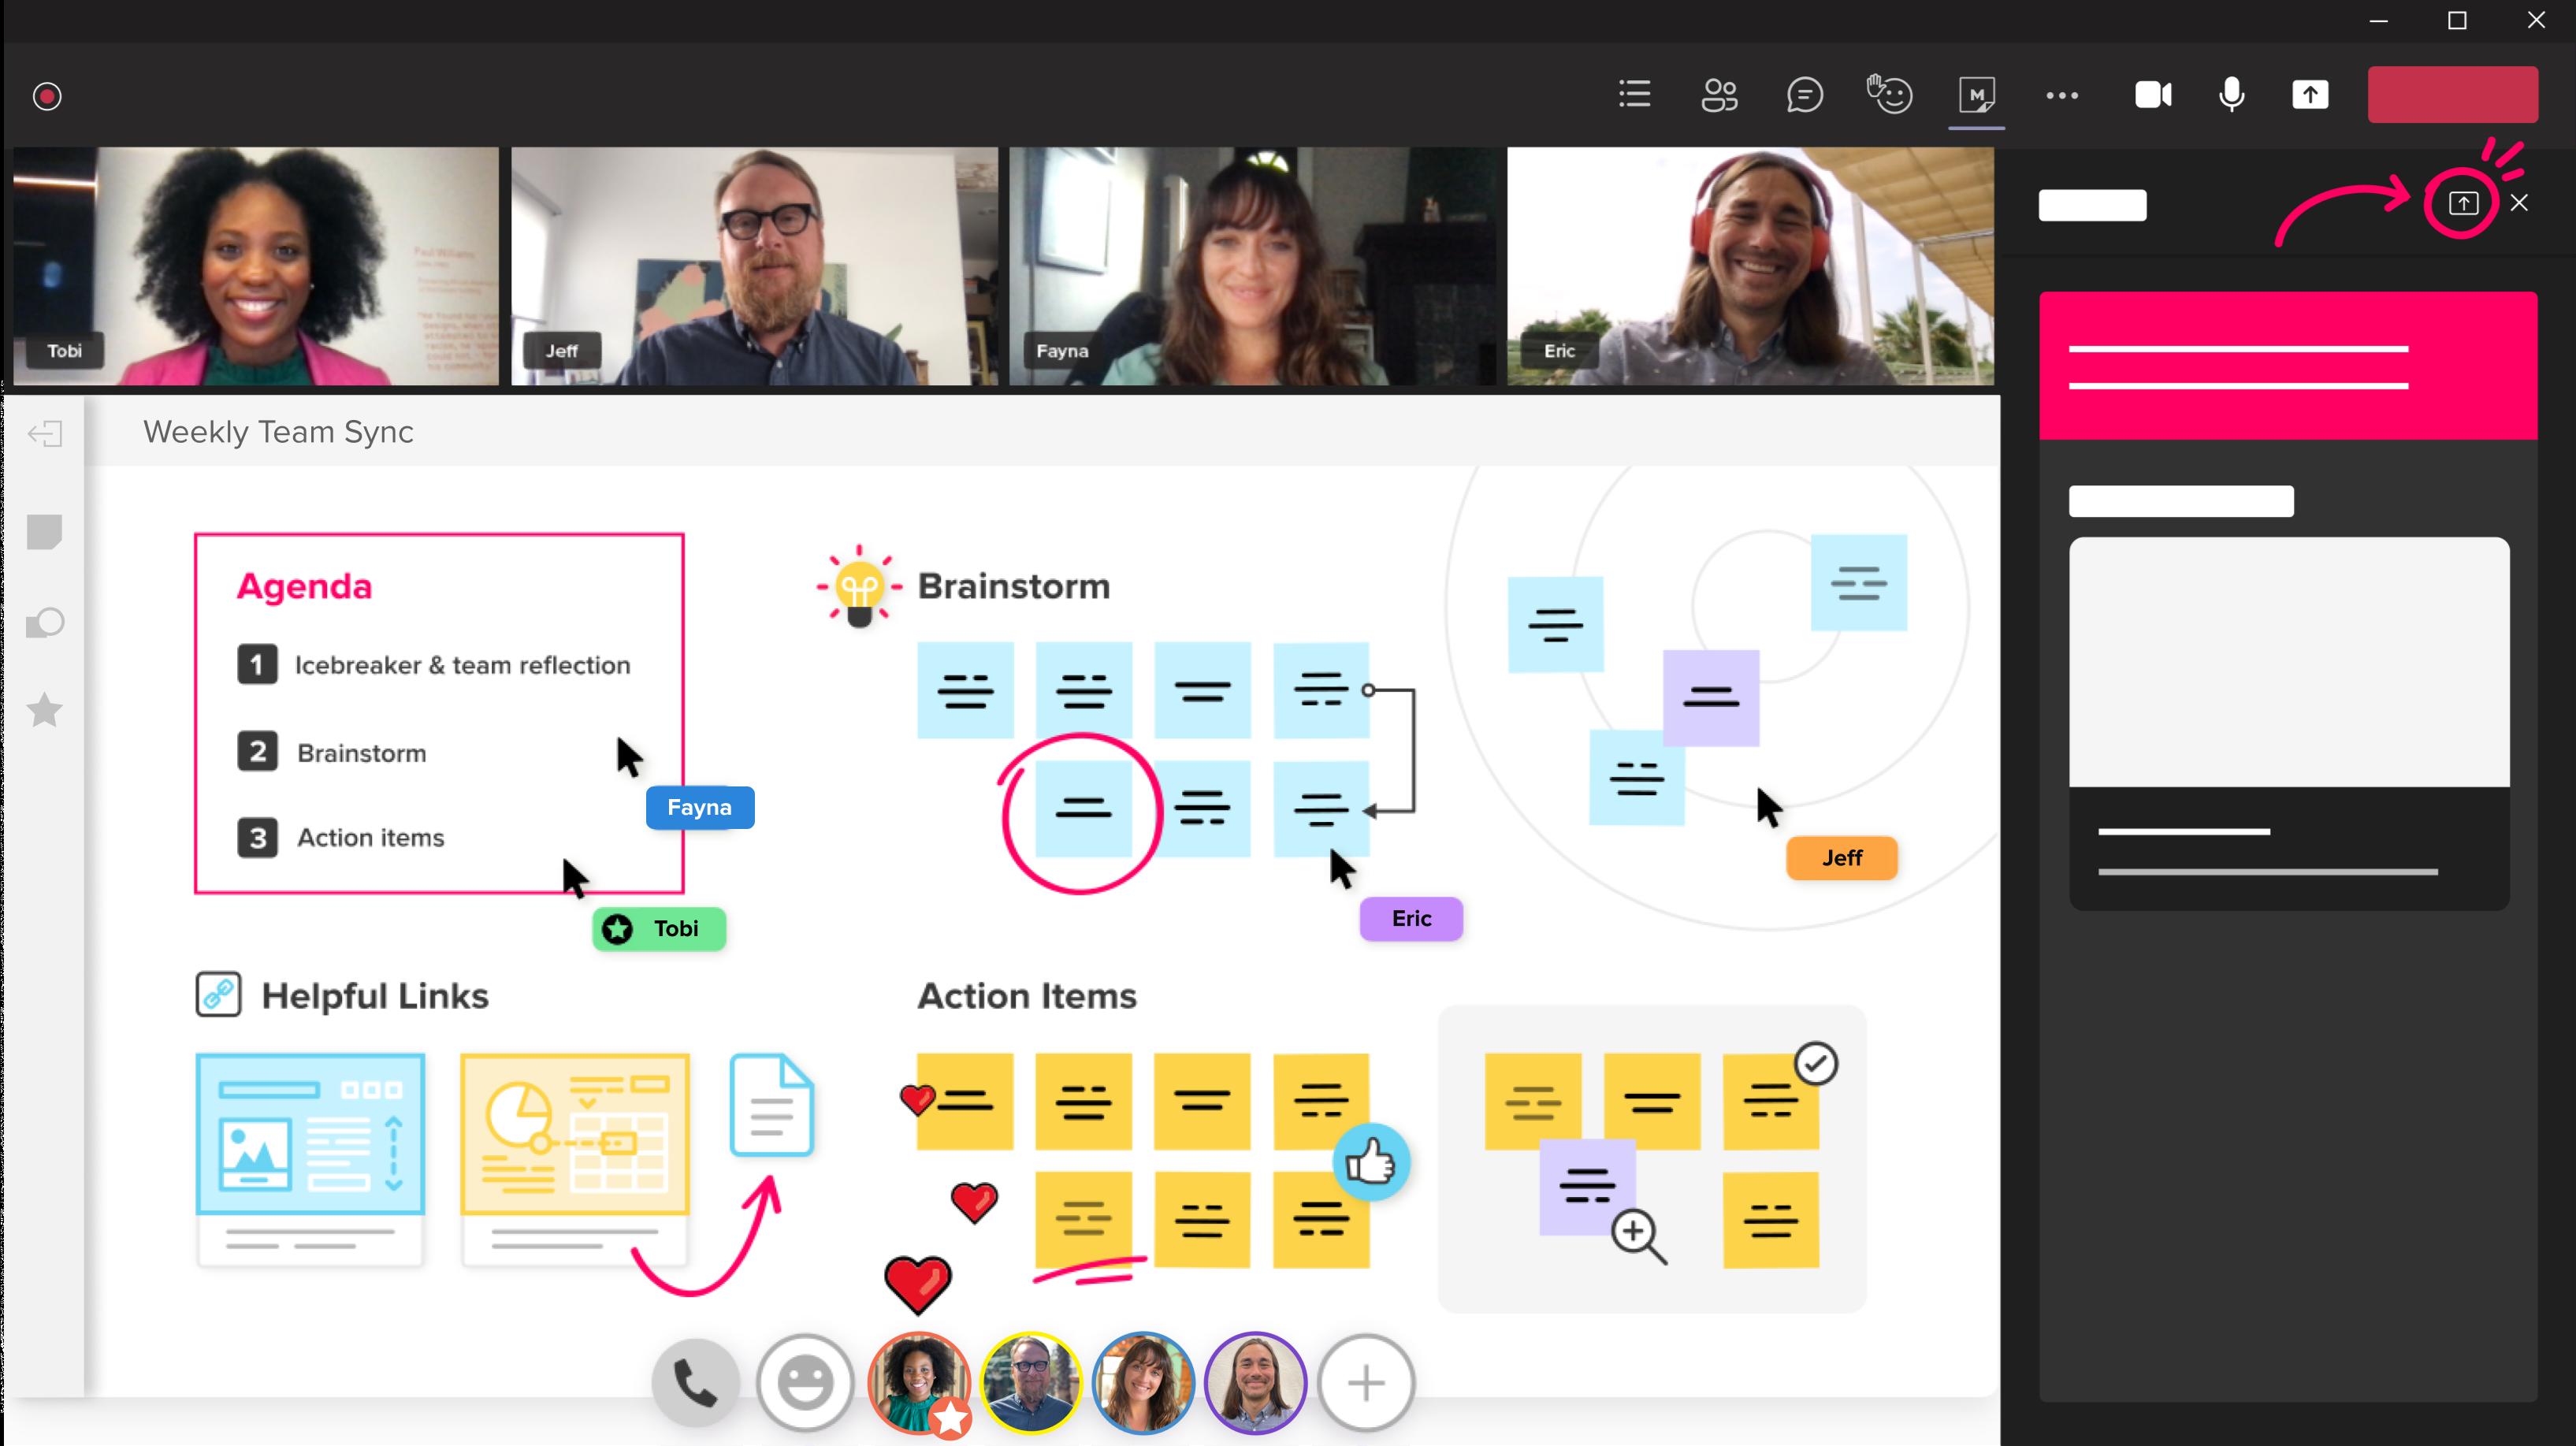 MURAL's New Integration Brings Visual Collaboration to Microsoft Teams